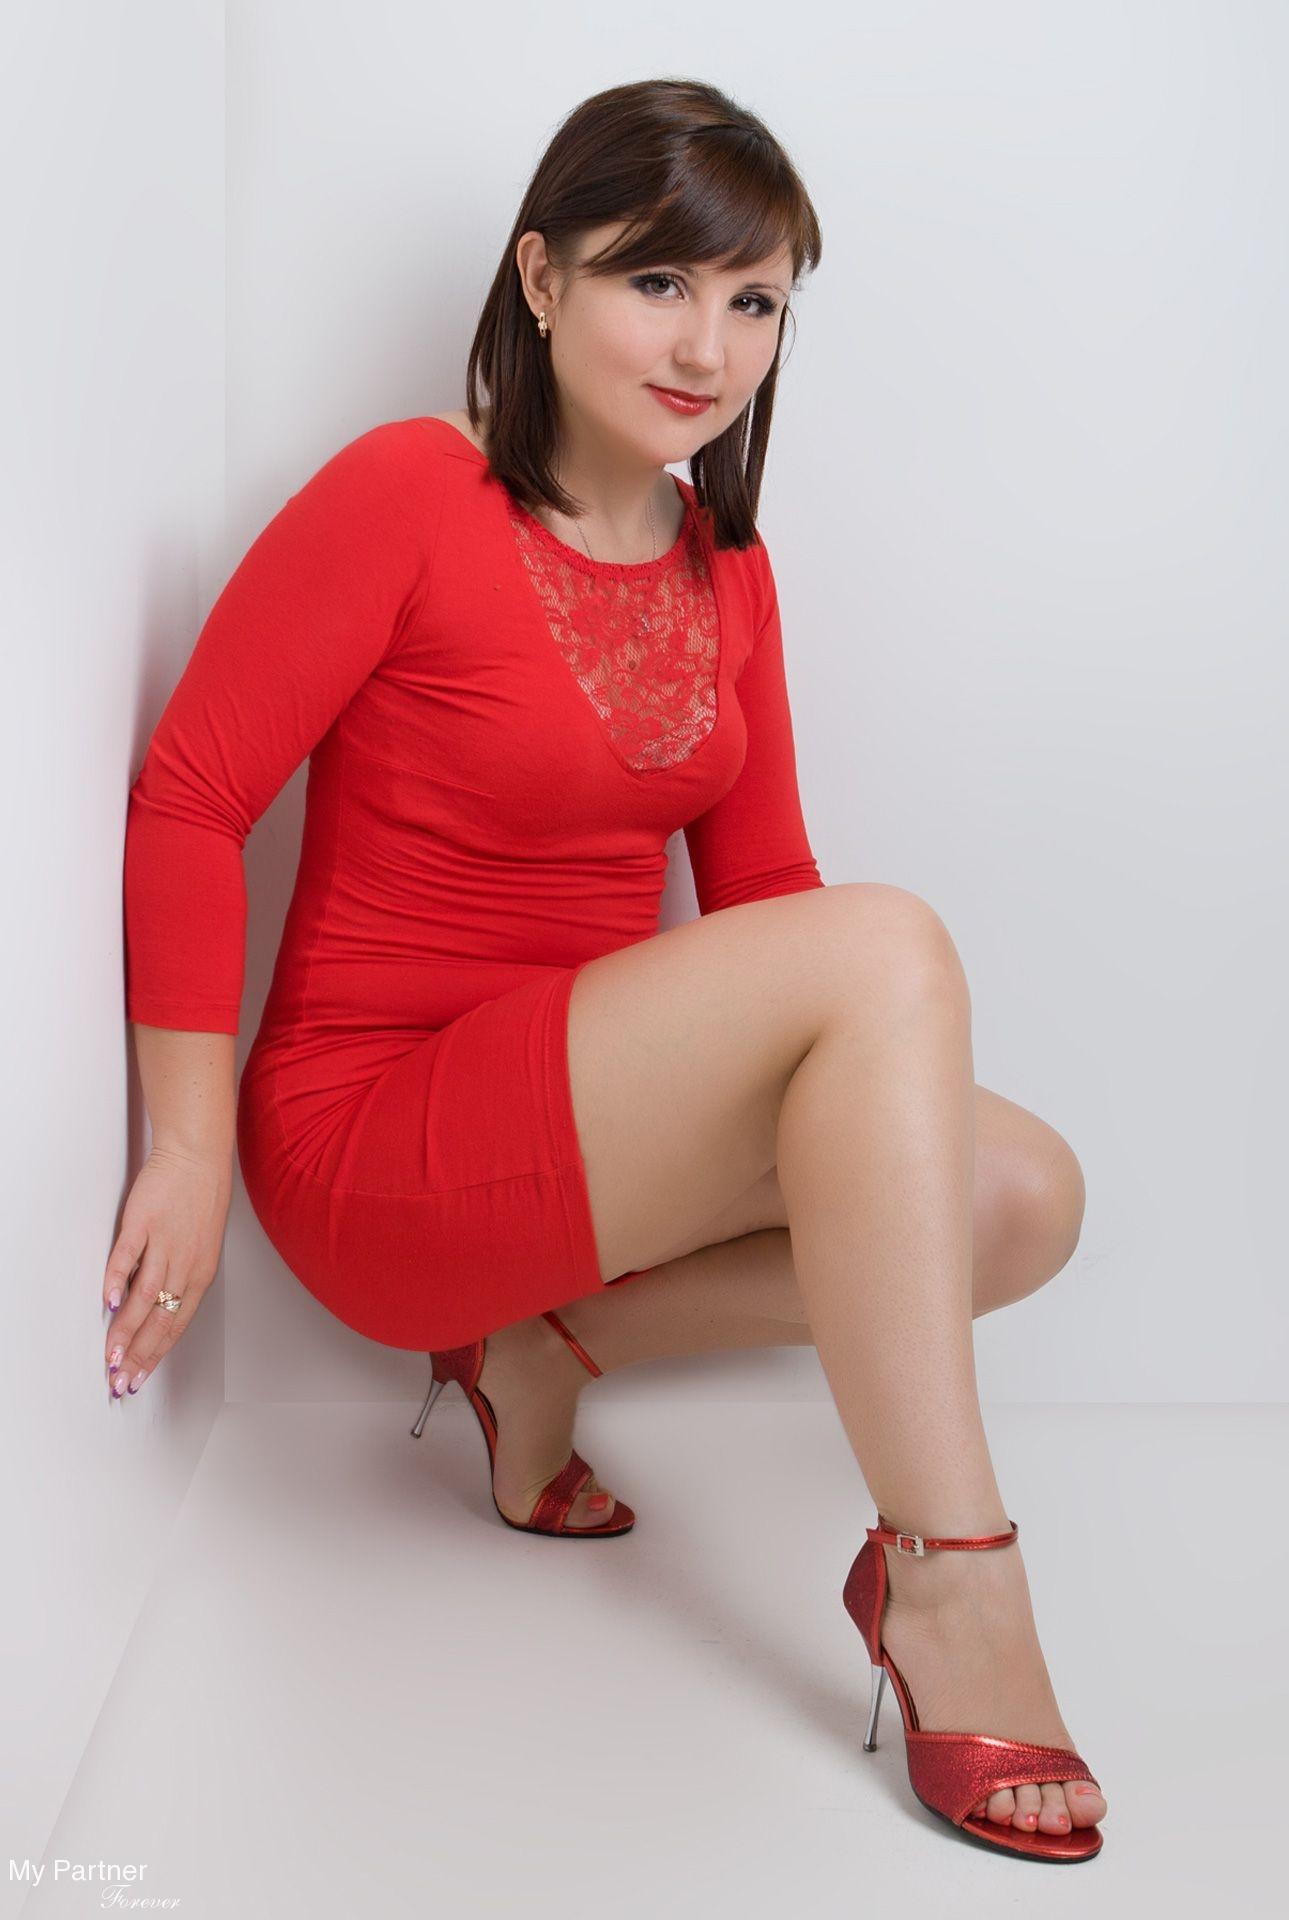 Asian porn free pics